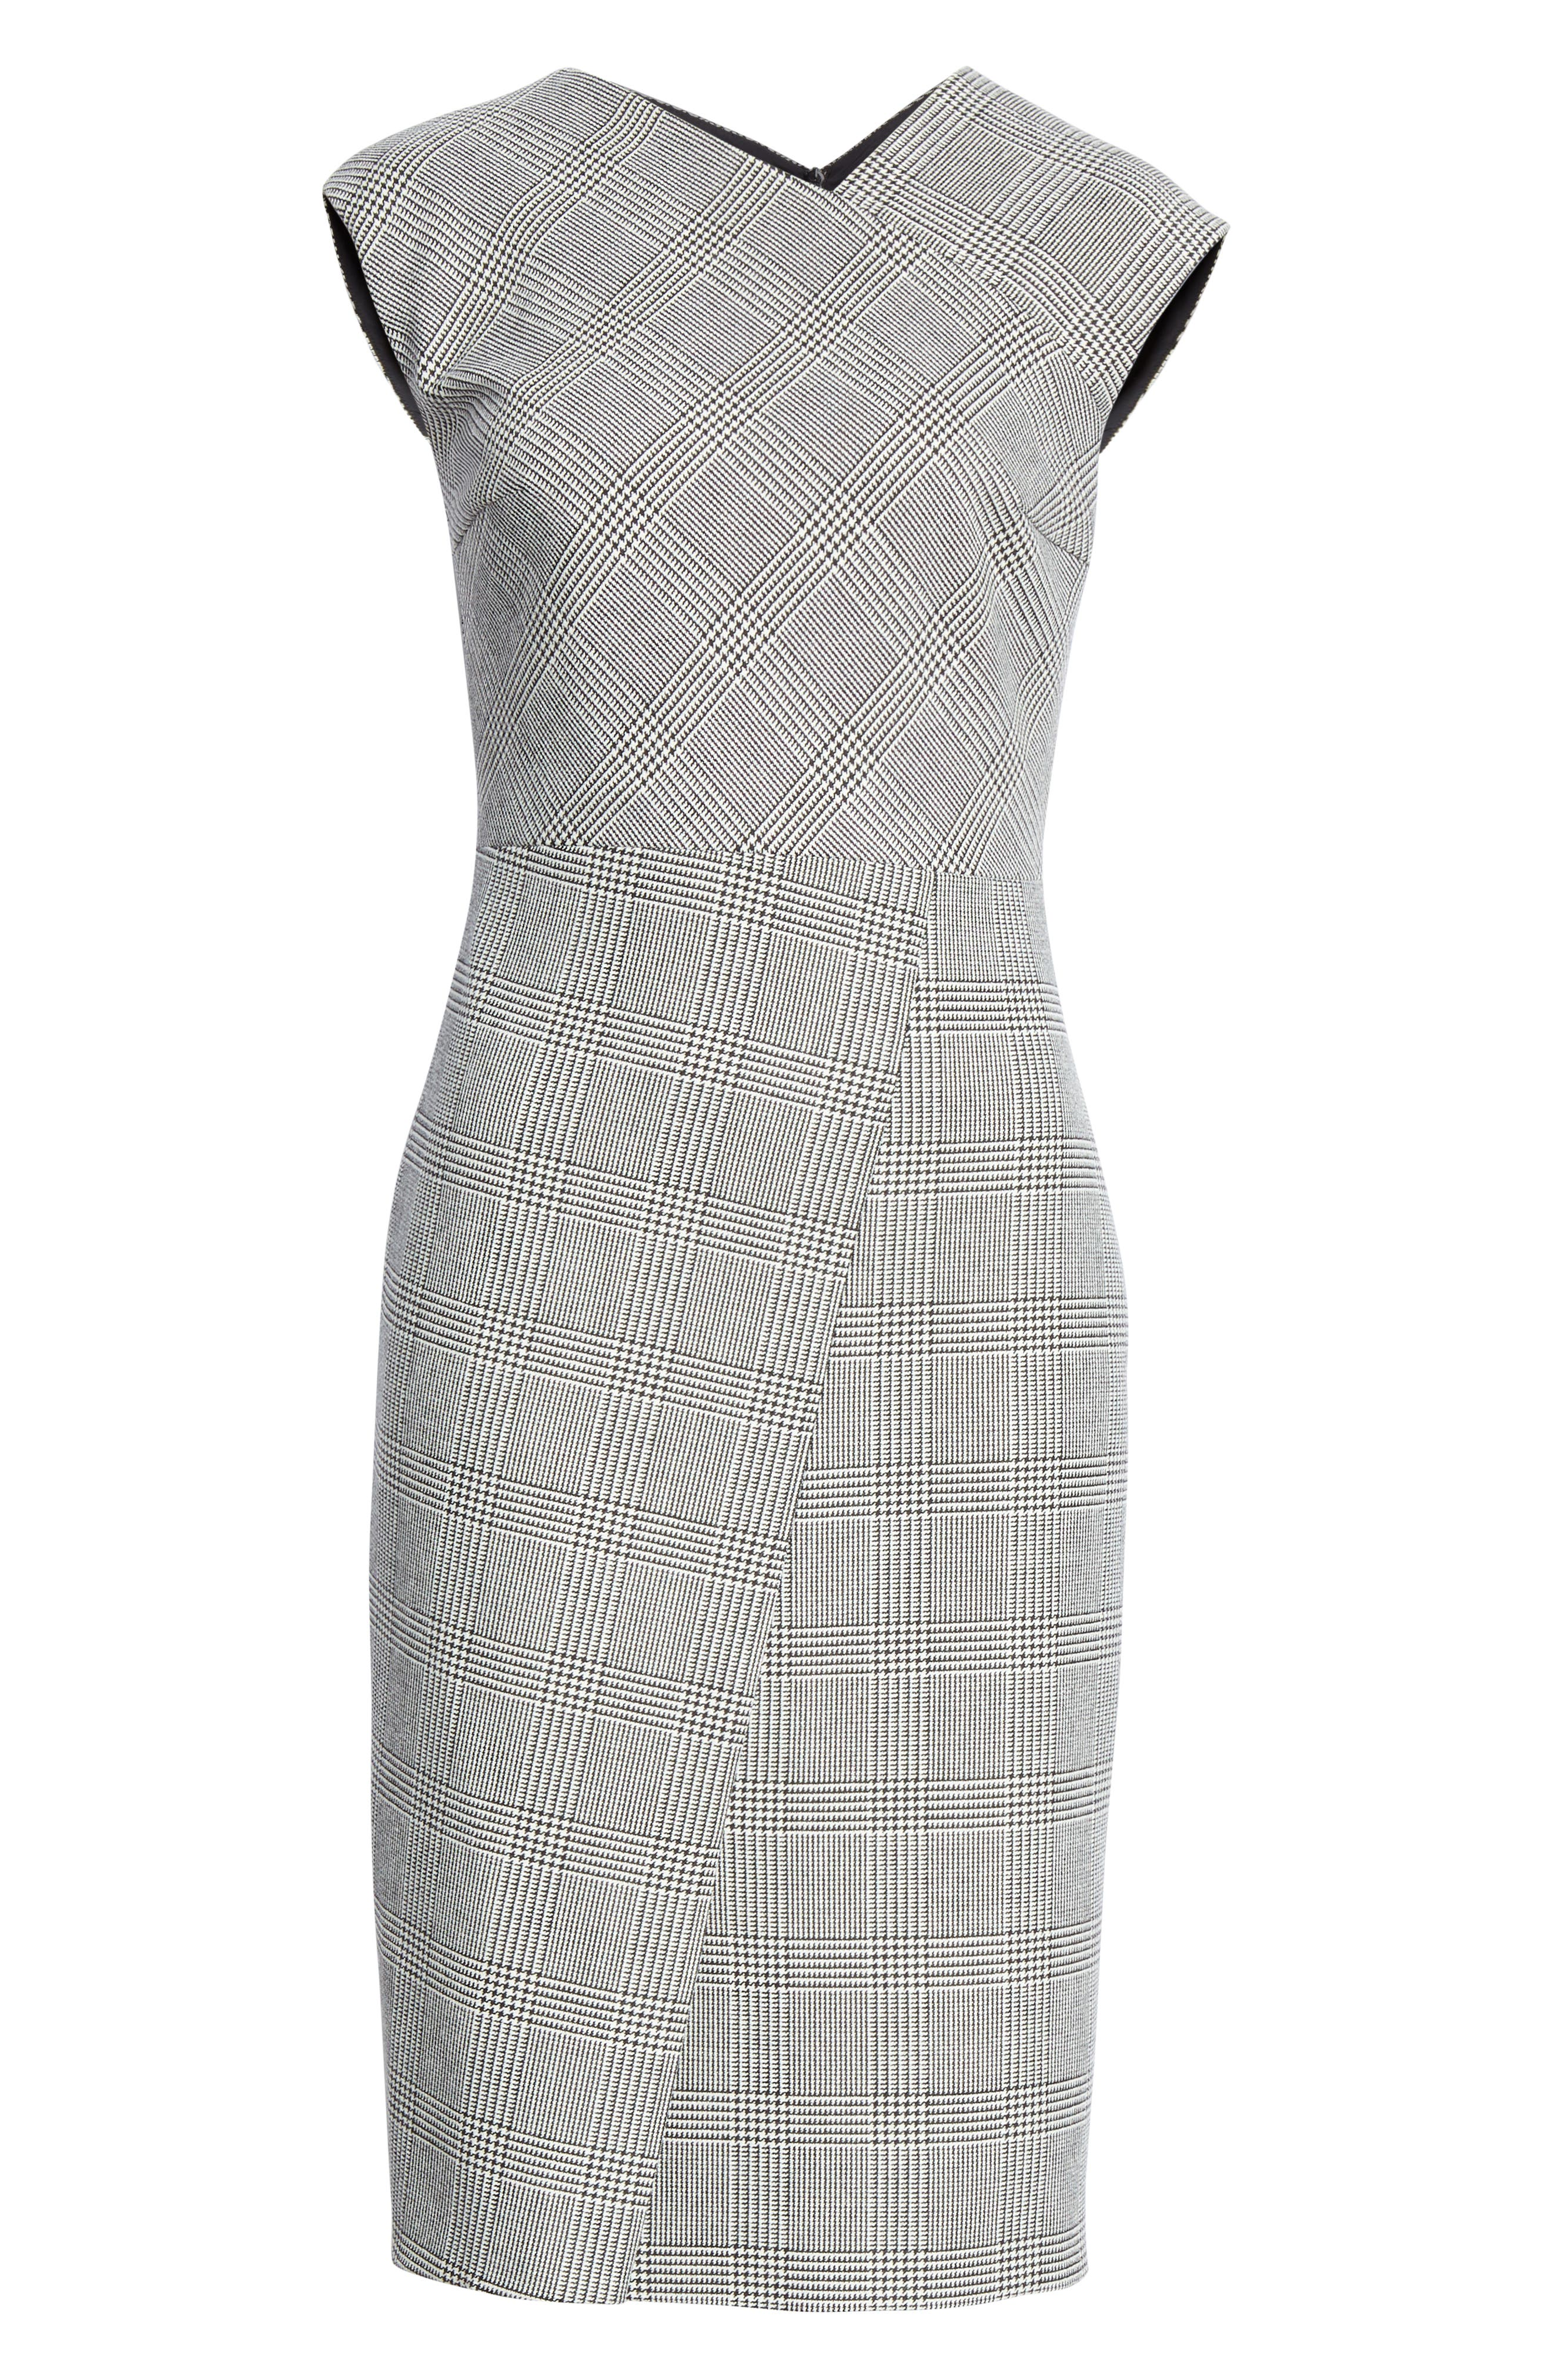 BOSS, Dechesta Glen Plaid Sheath Dress, Alternate thumbnail 7, color, 020